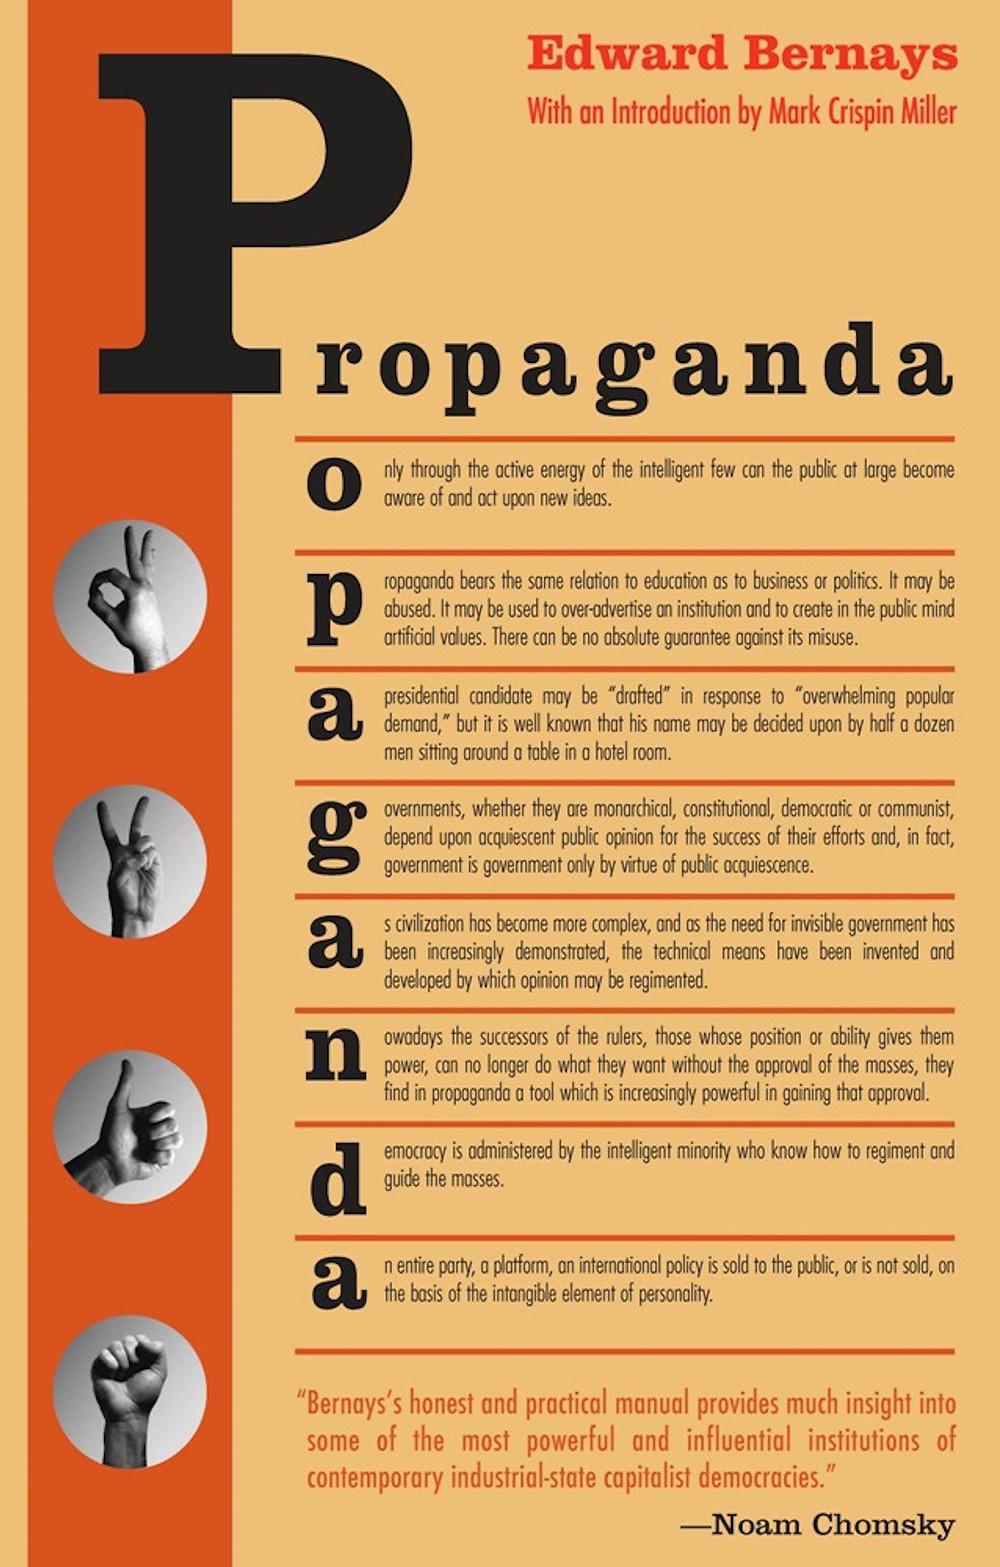 Propaganda: Enemy of the Great Work